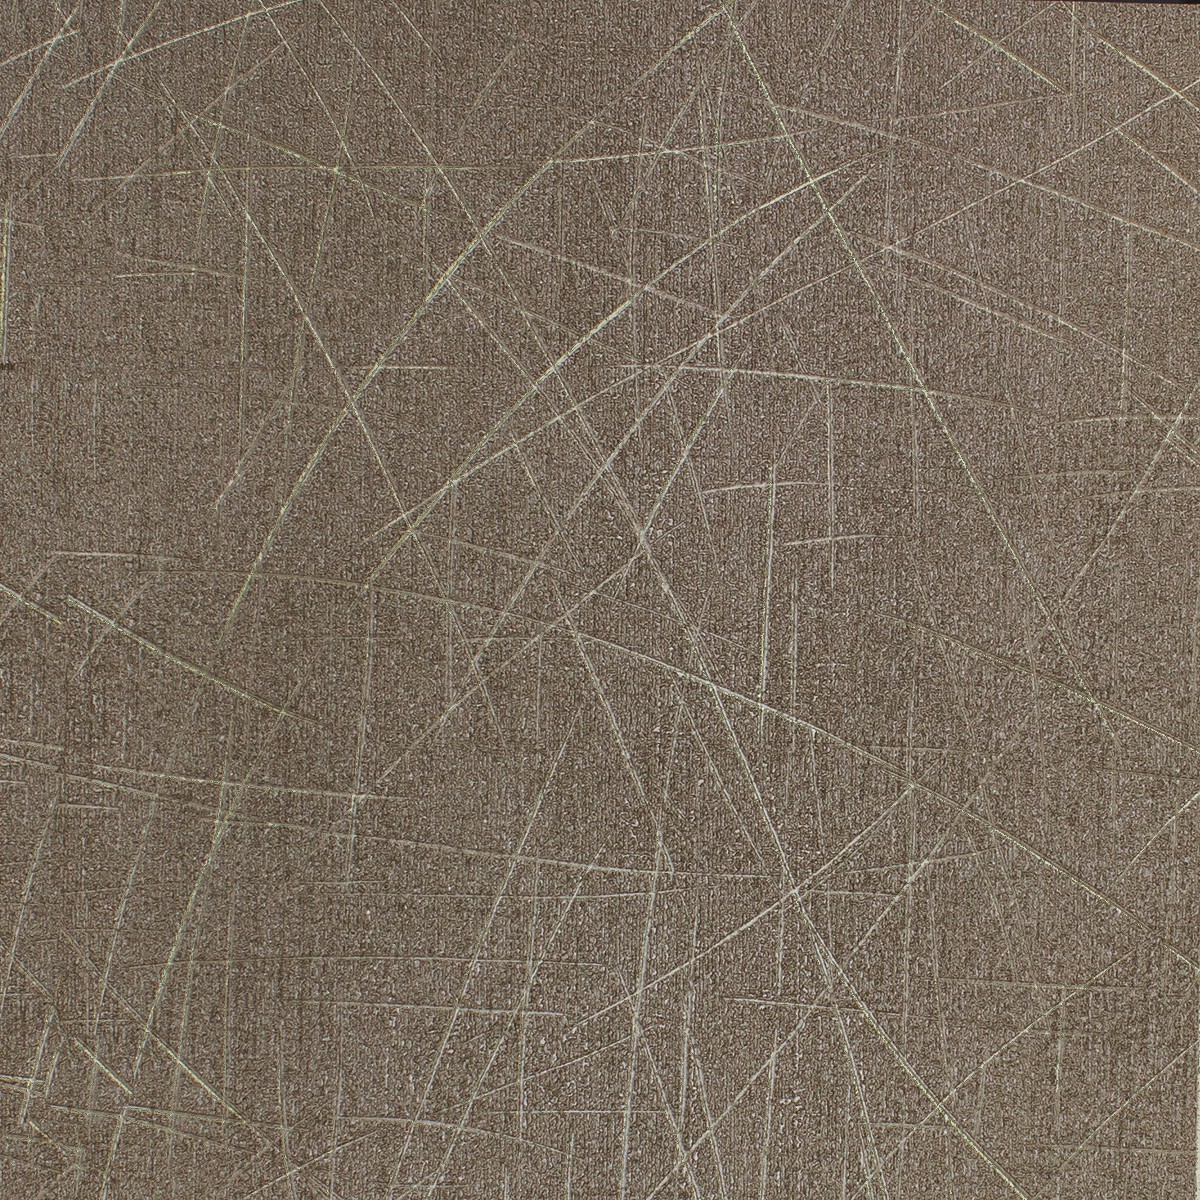 Vliestapete luigi colani struktur beige 53308 for As tapeten shop